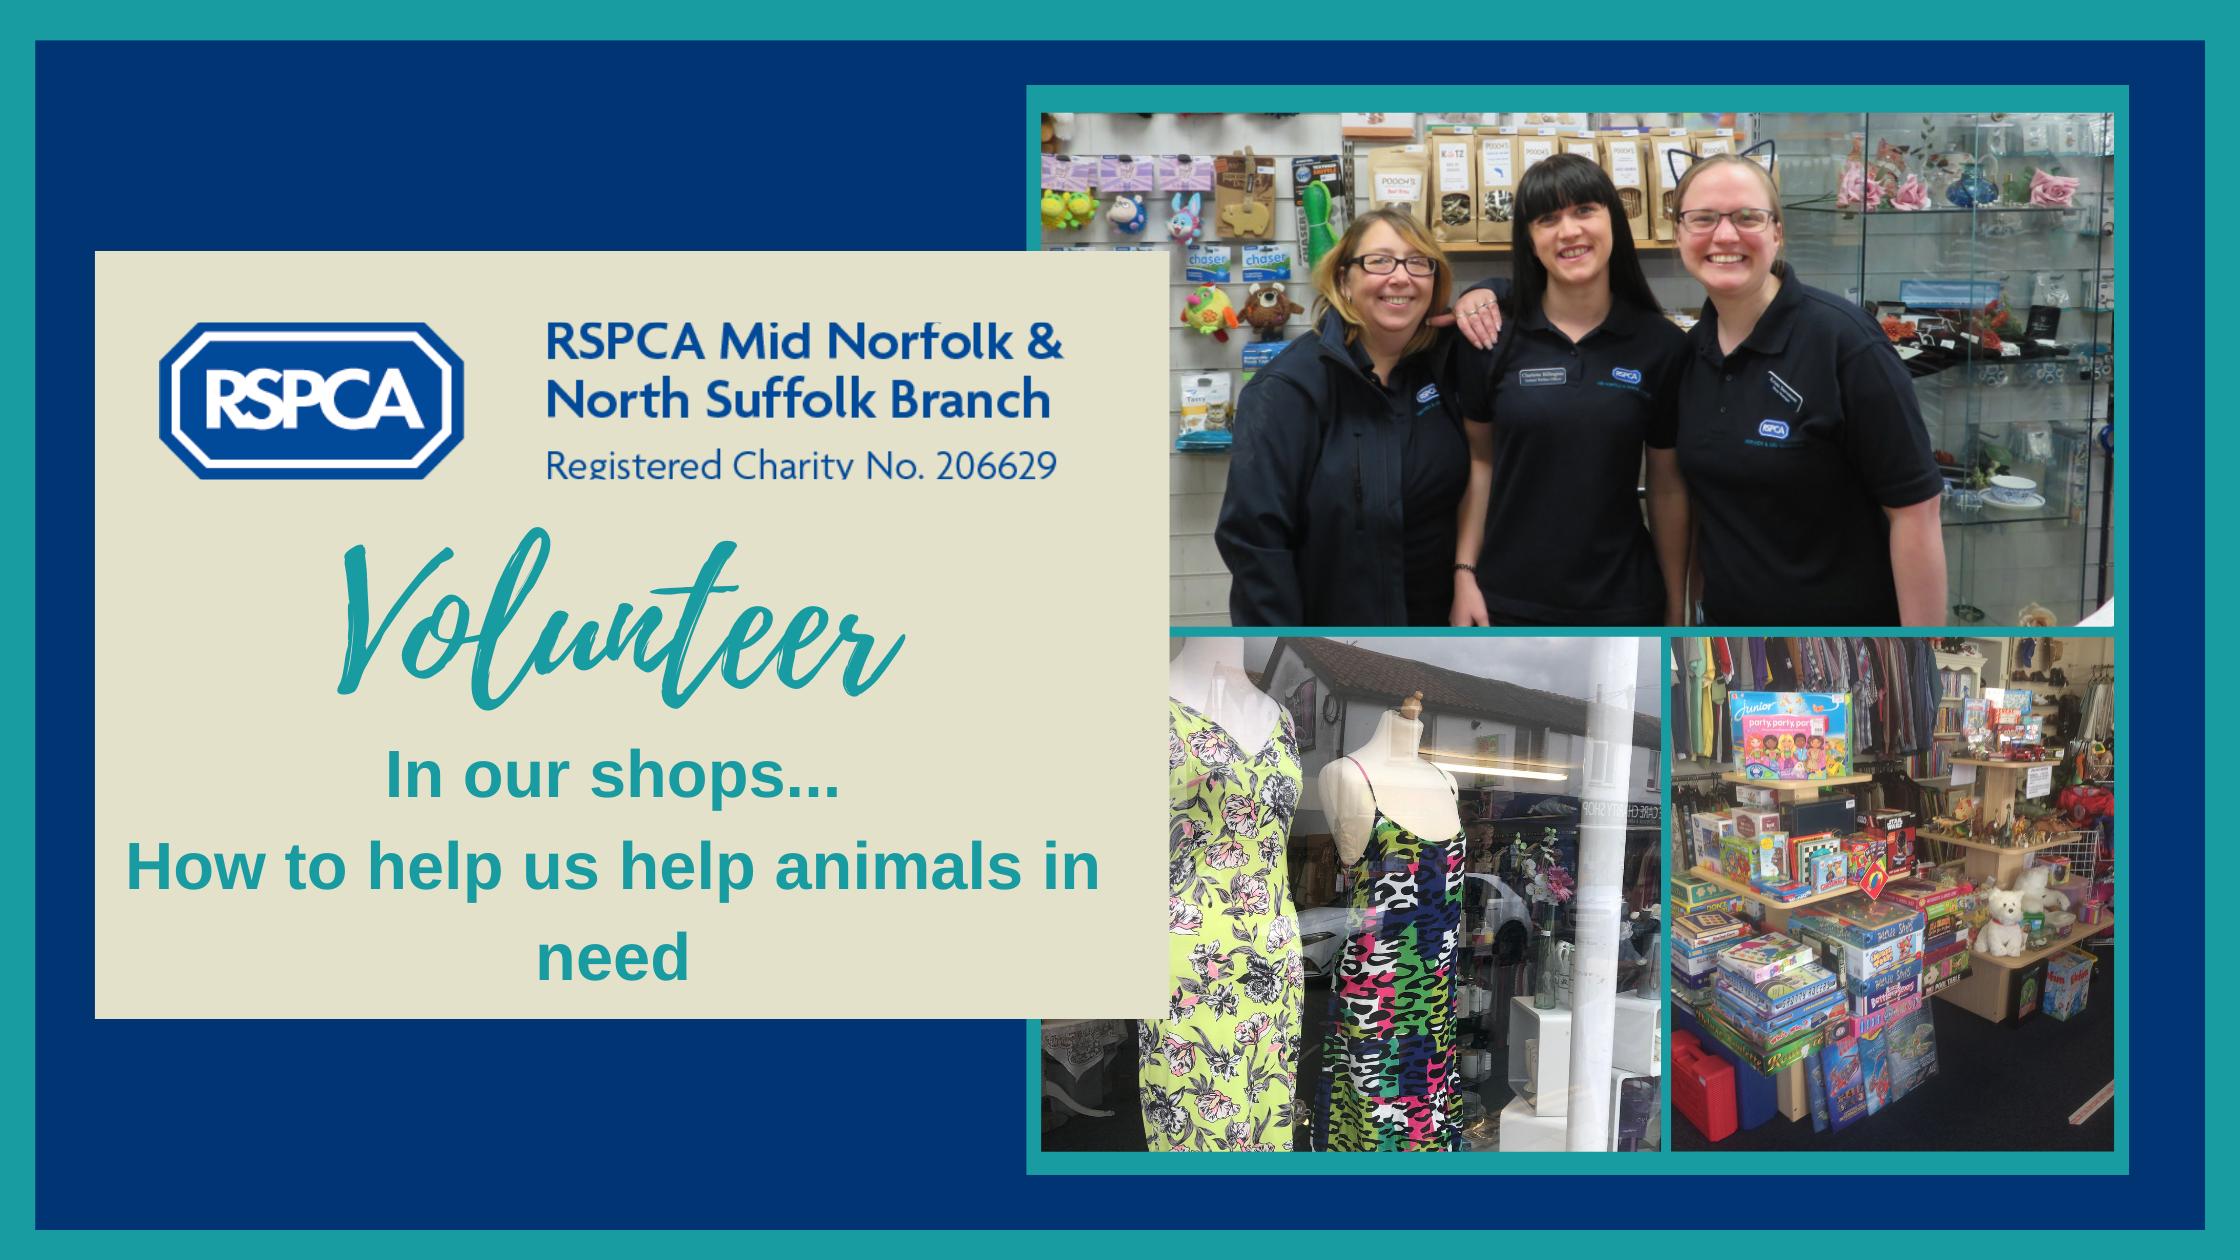 Volunteering- how can I help animals in need?